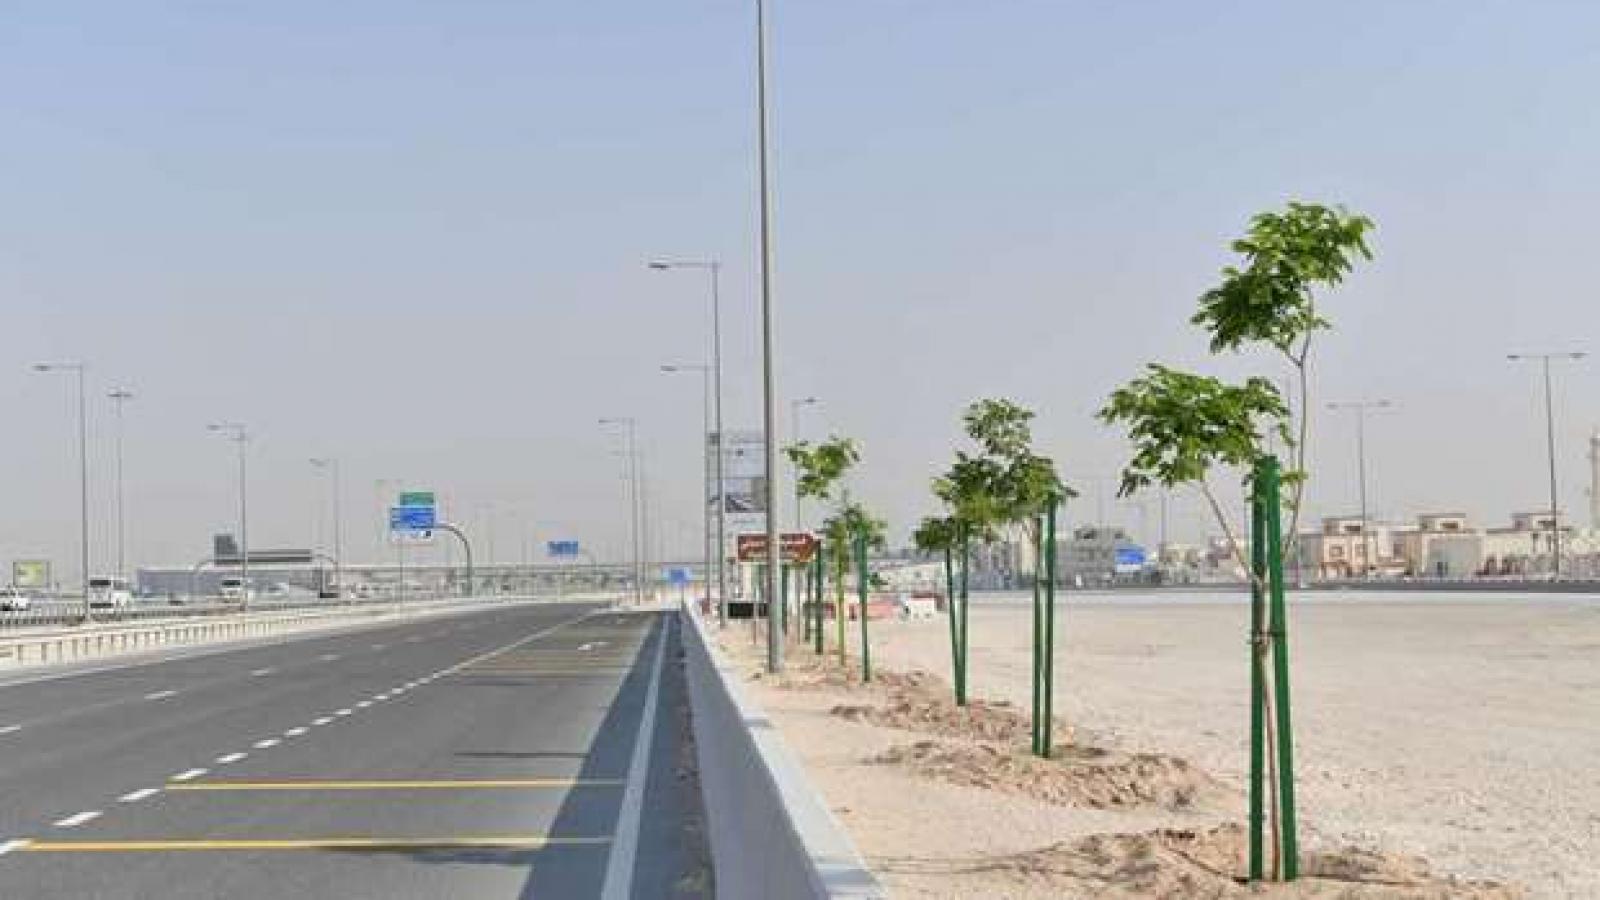 Qatar to plant over 4,400 trees on Shamal Road